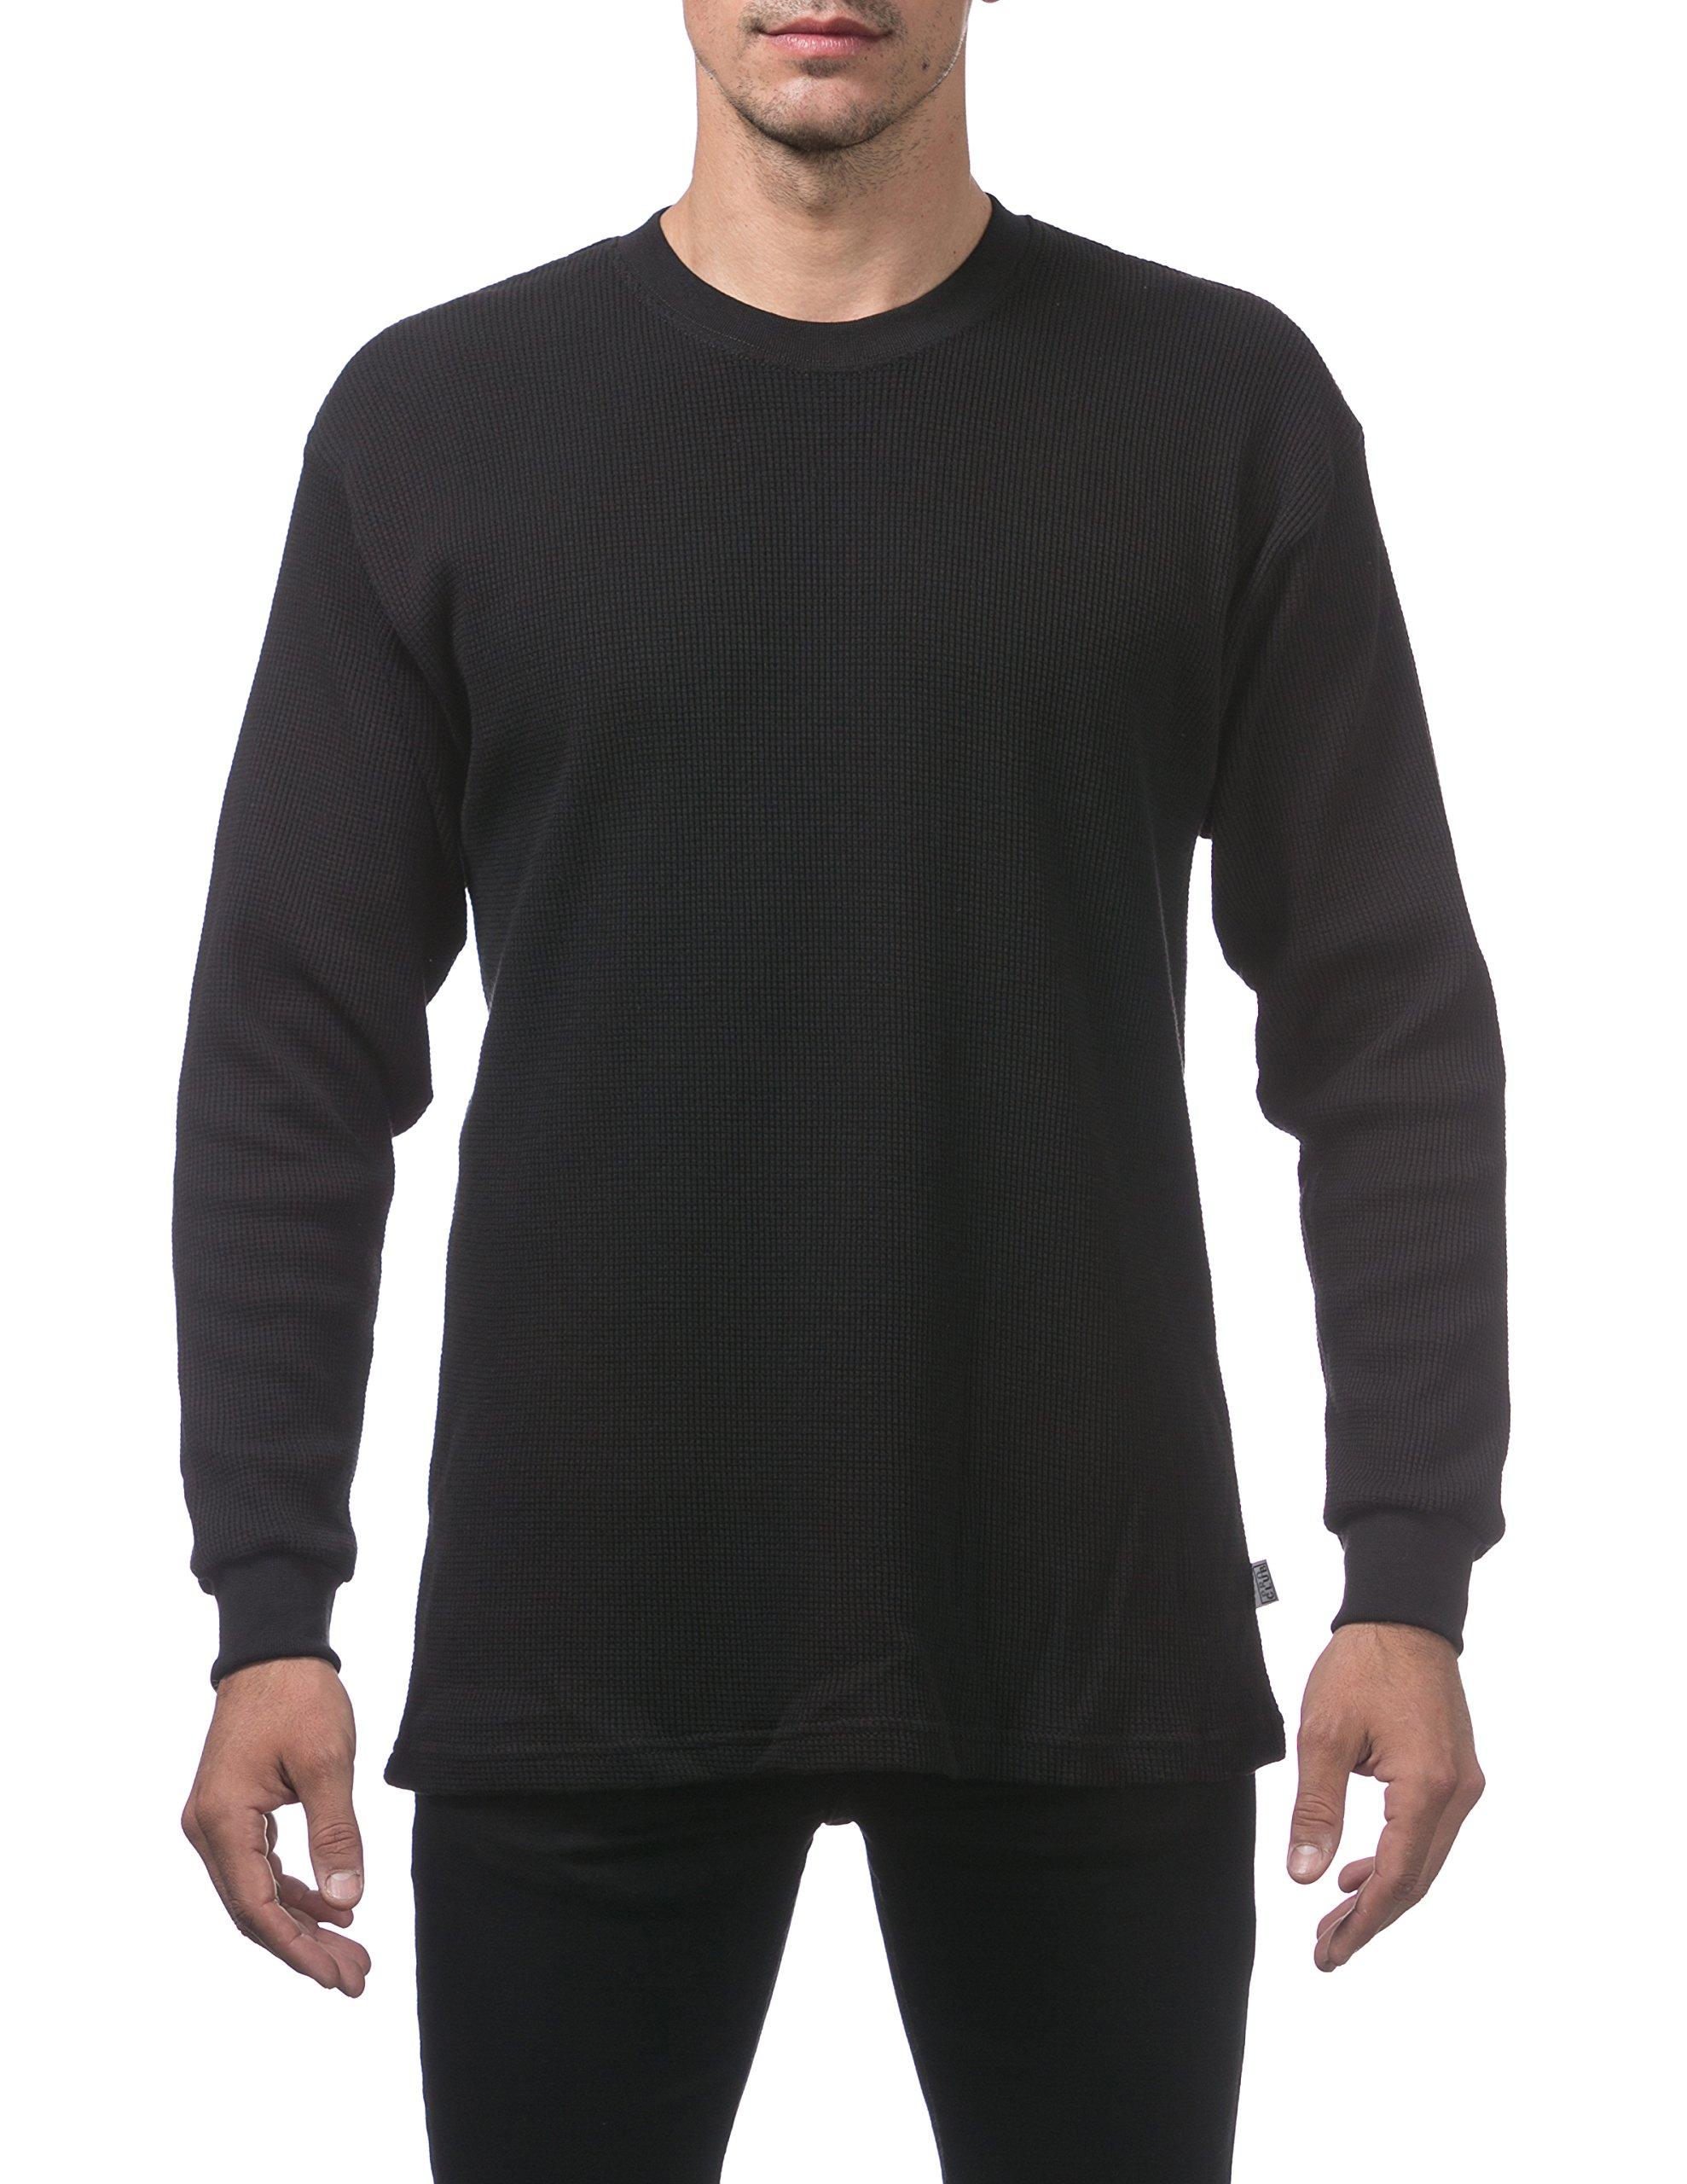 Pro Club Men's Heavyweight Cotton Long Sleeve Thermal Top, Medium, Black by Pro Club